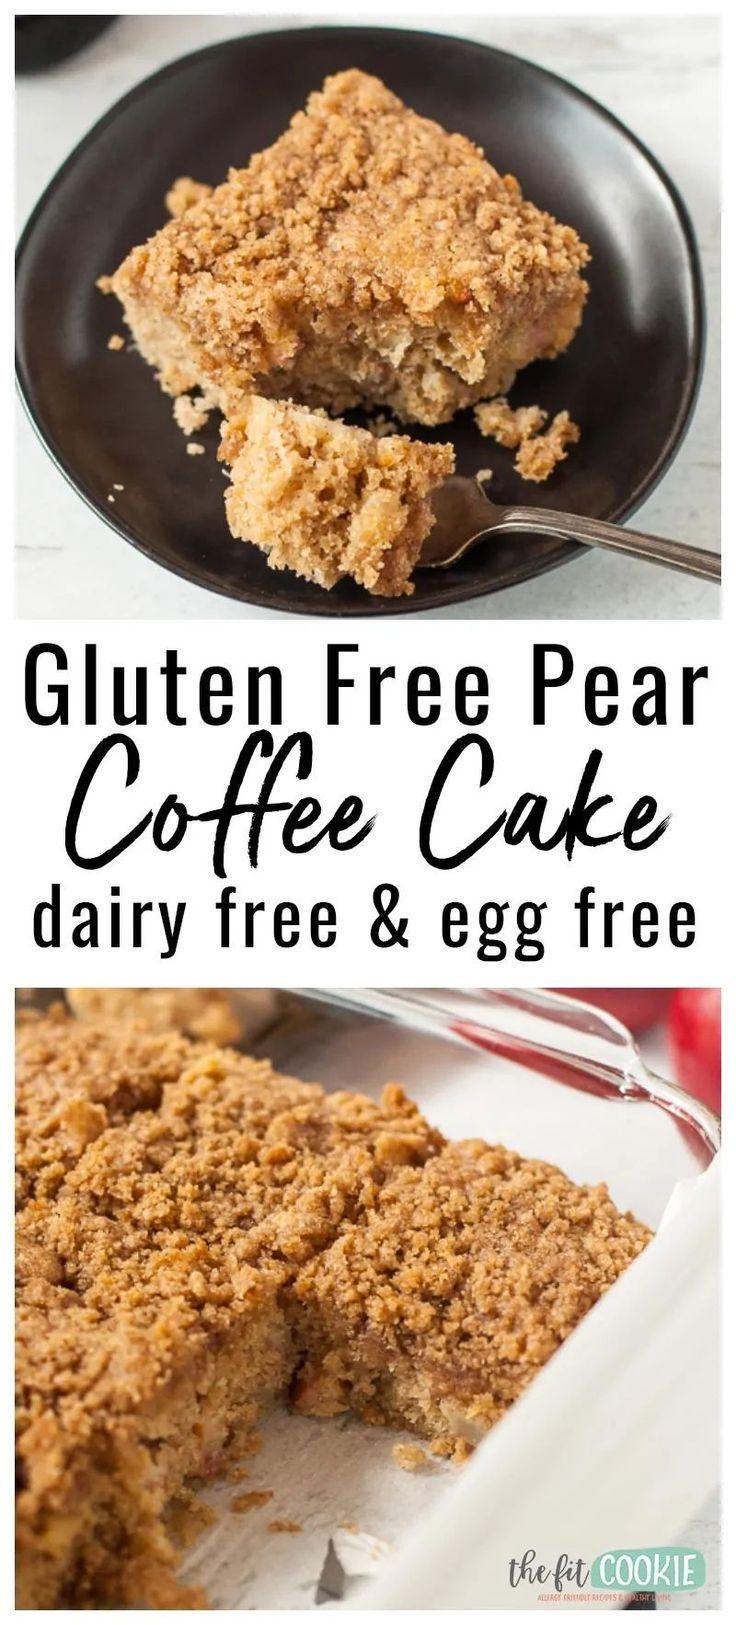 Gluten Free Coffee Cake with Pears (Dairy Free) #glutenfreebreakfasts